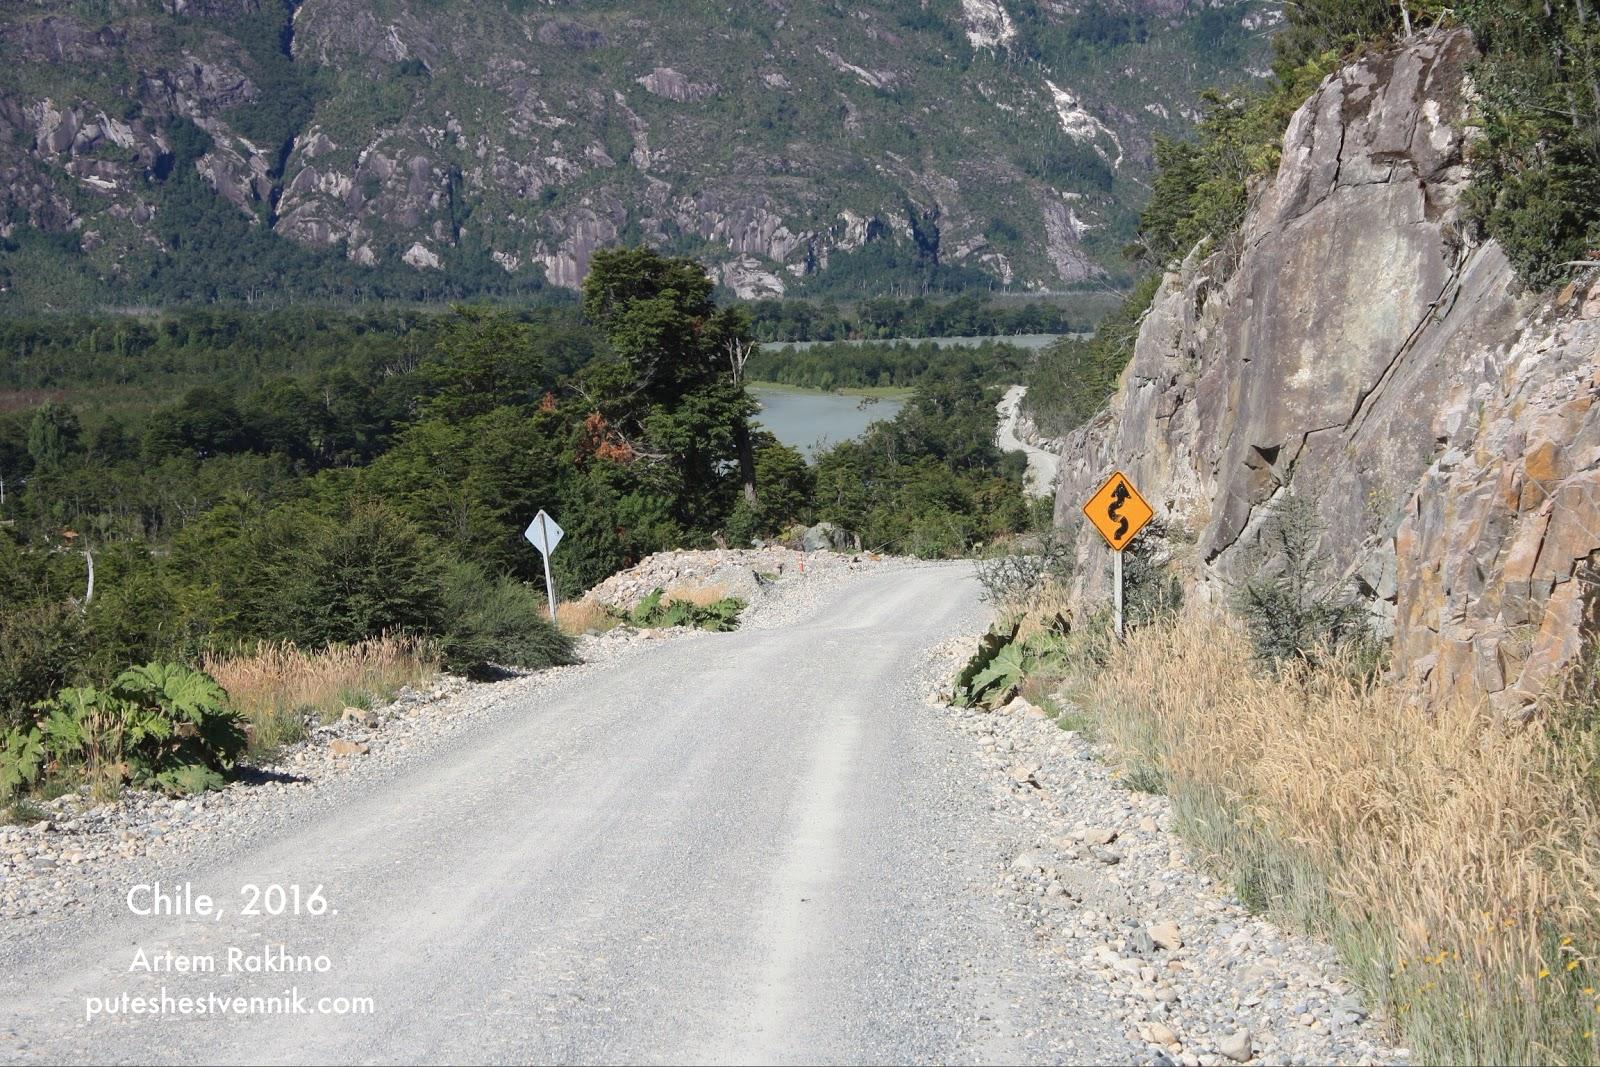 Дорога в сторону Виллы О Хиггинс